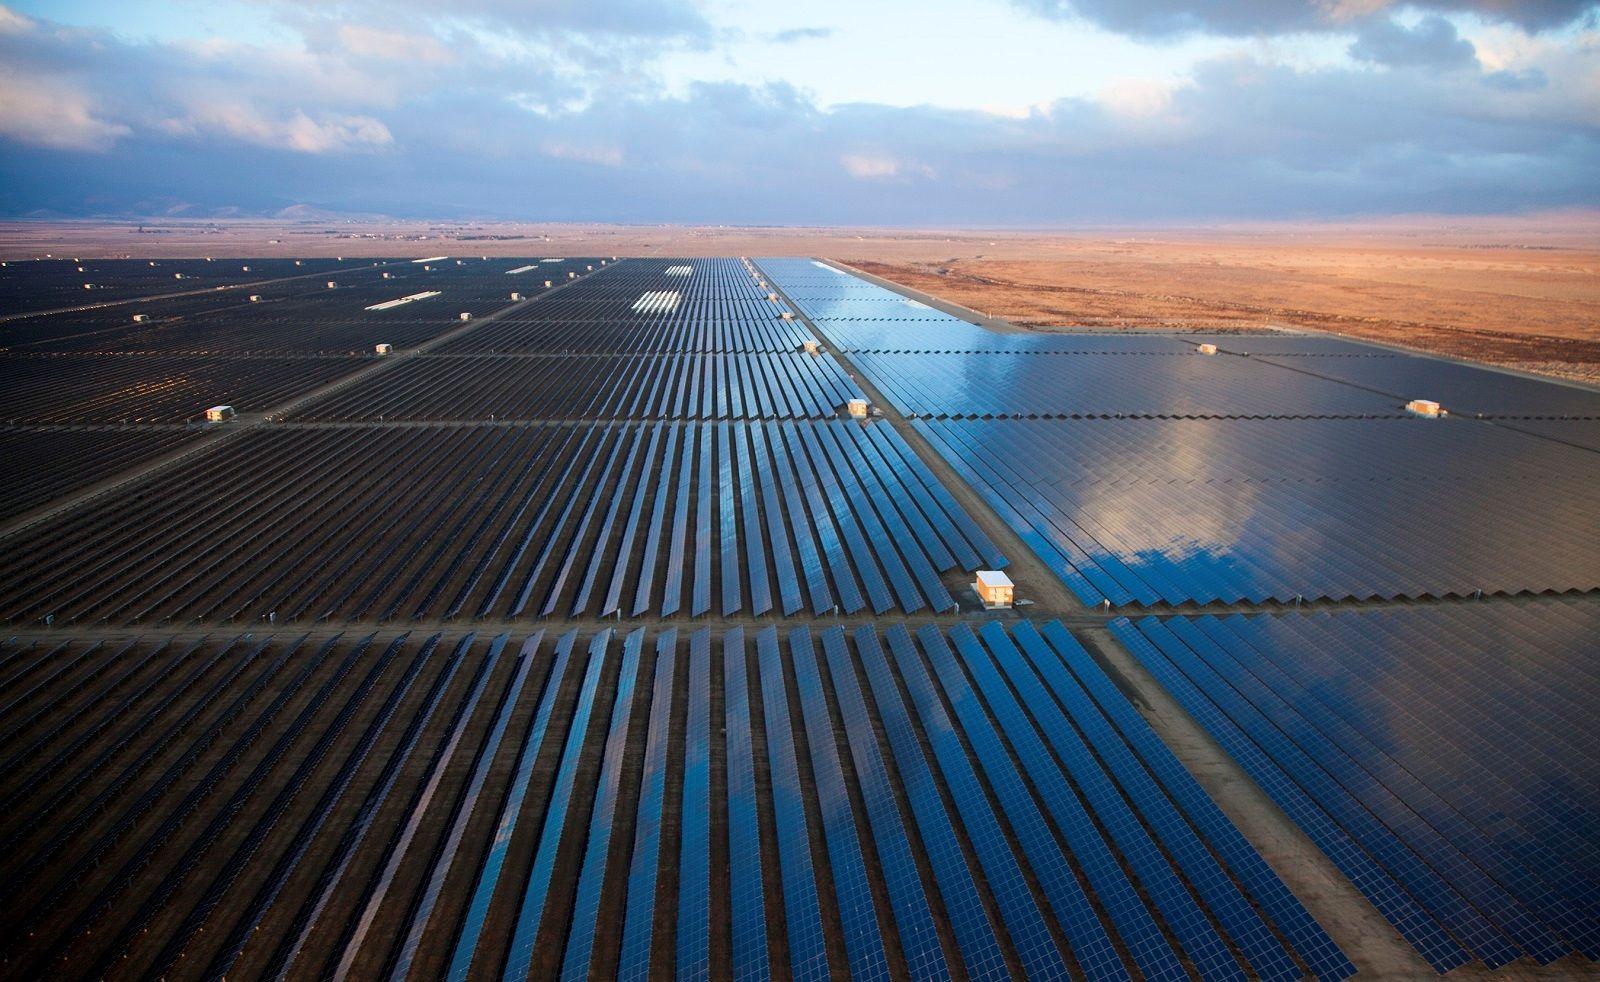 Egypt To Build The World S Biggest Solar Farm Http Ift Tt 2l0okmr Uses Of Solar Energy Solar Energy Design Solar Farm